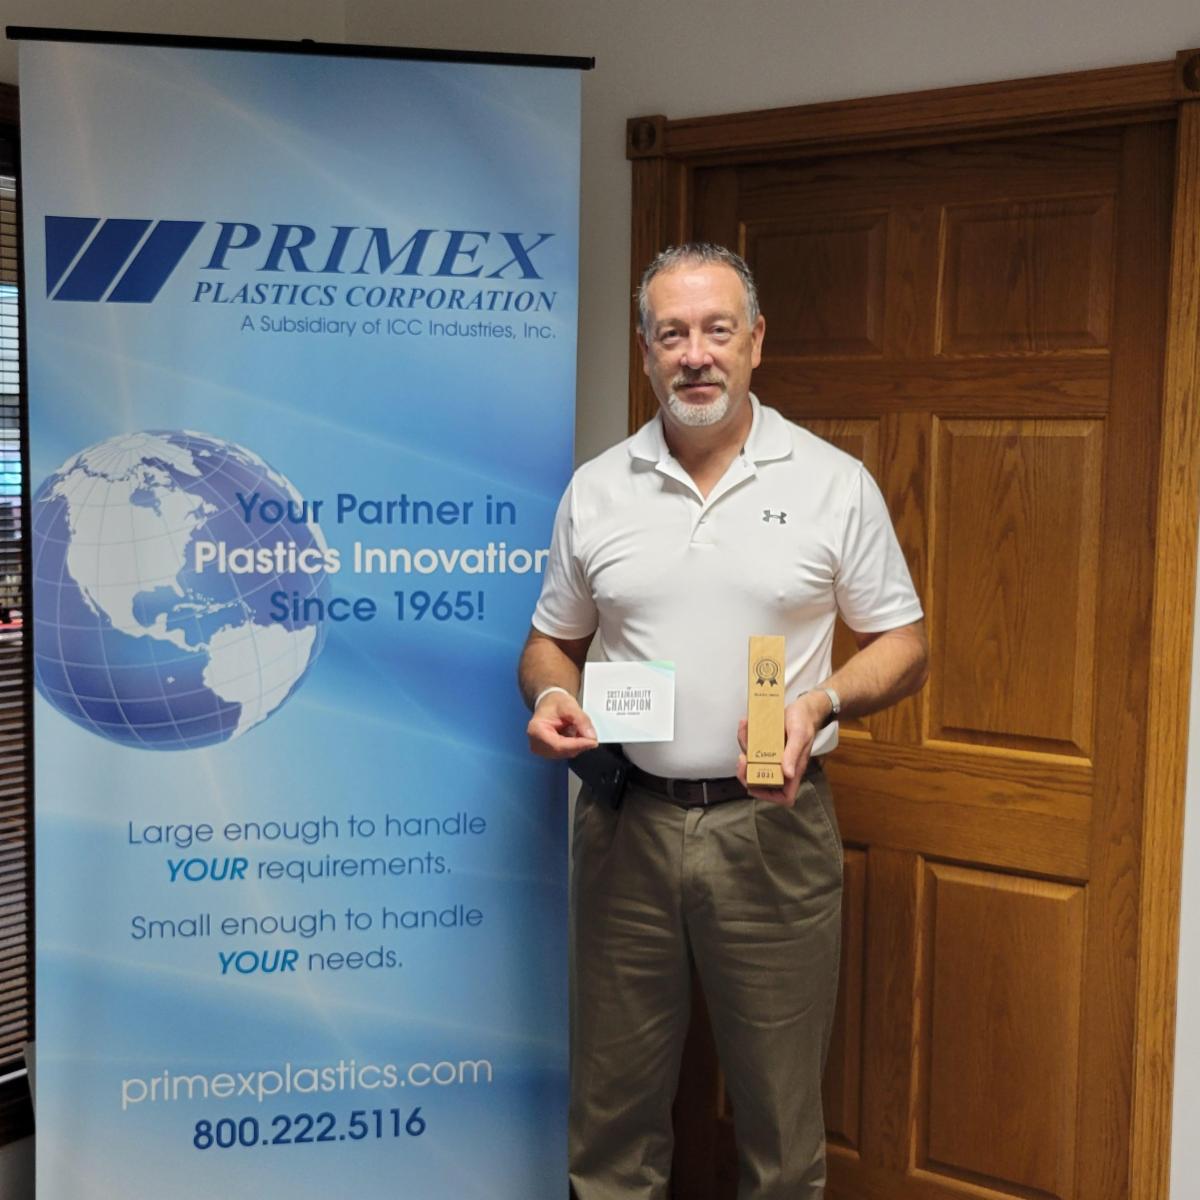 Blake Pace Primex Plastics